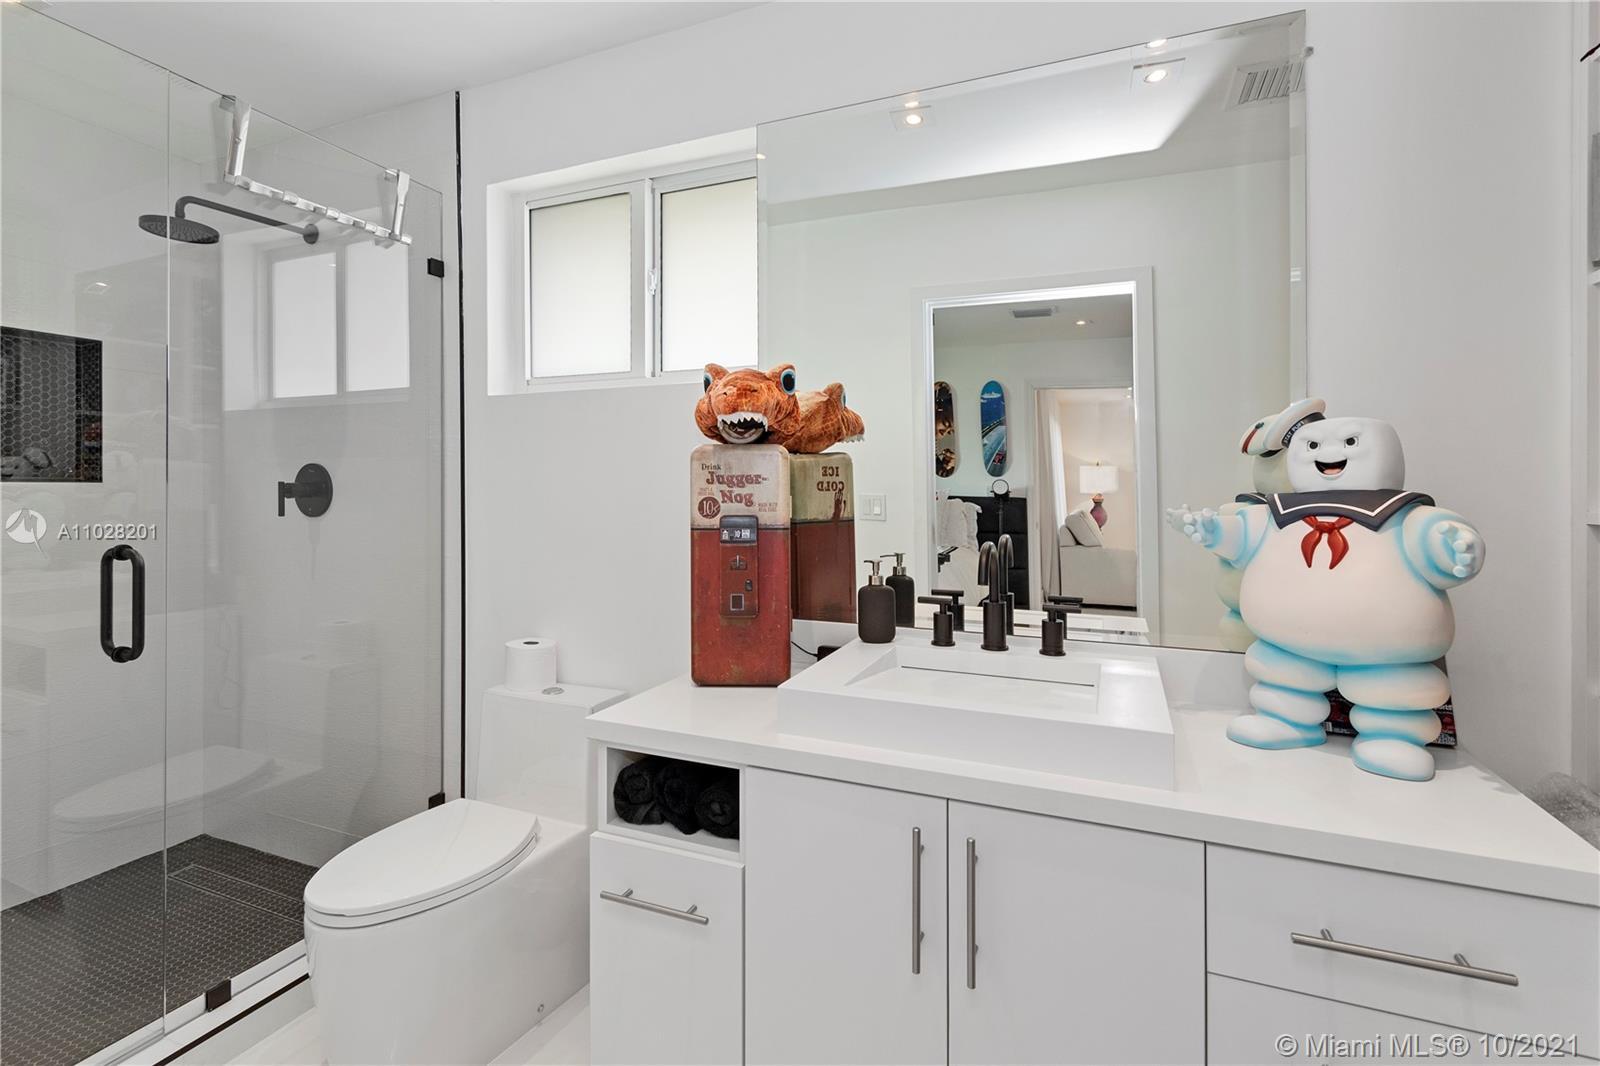 All new third bathroom with frameless glass shower door